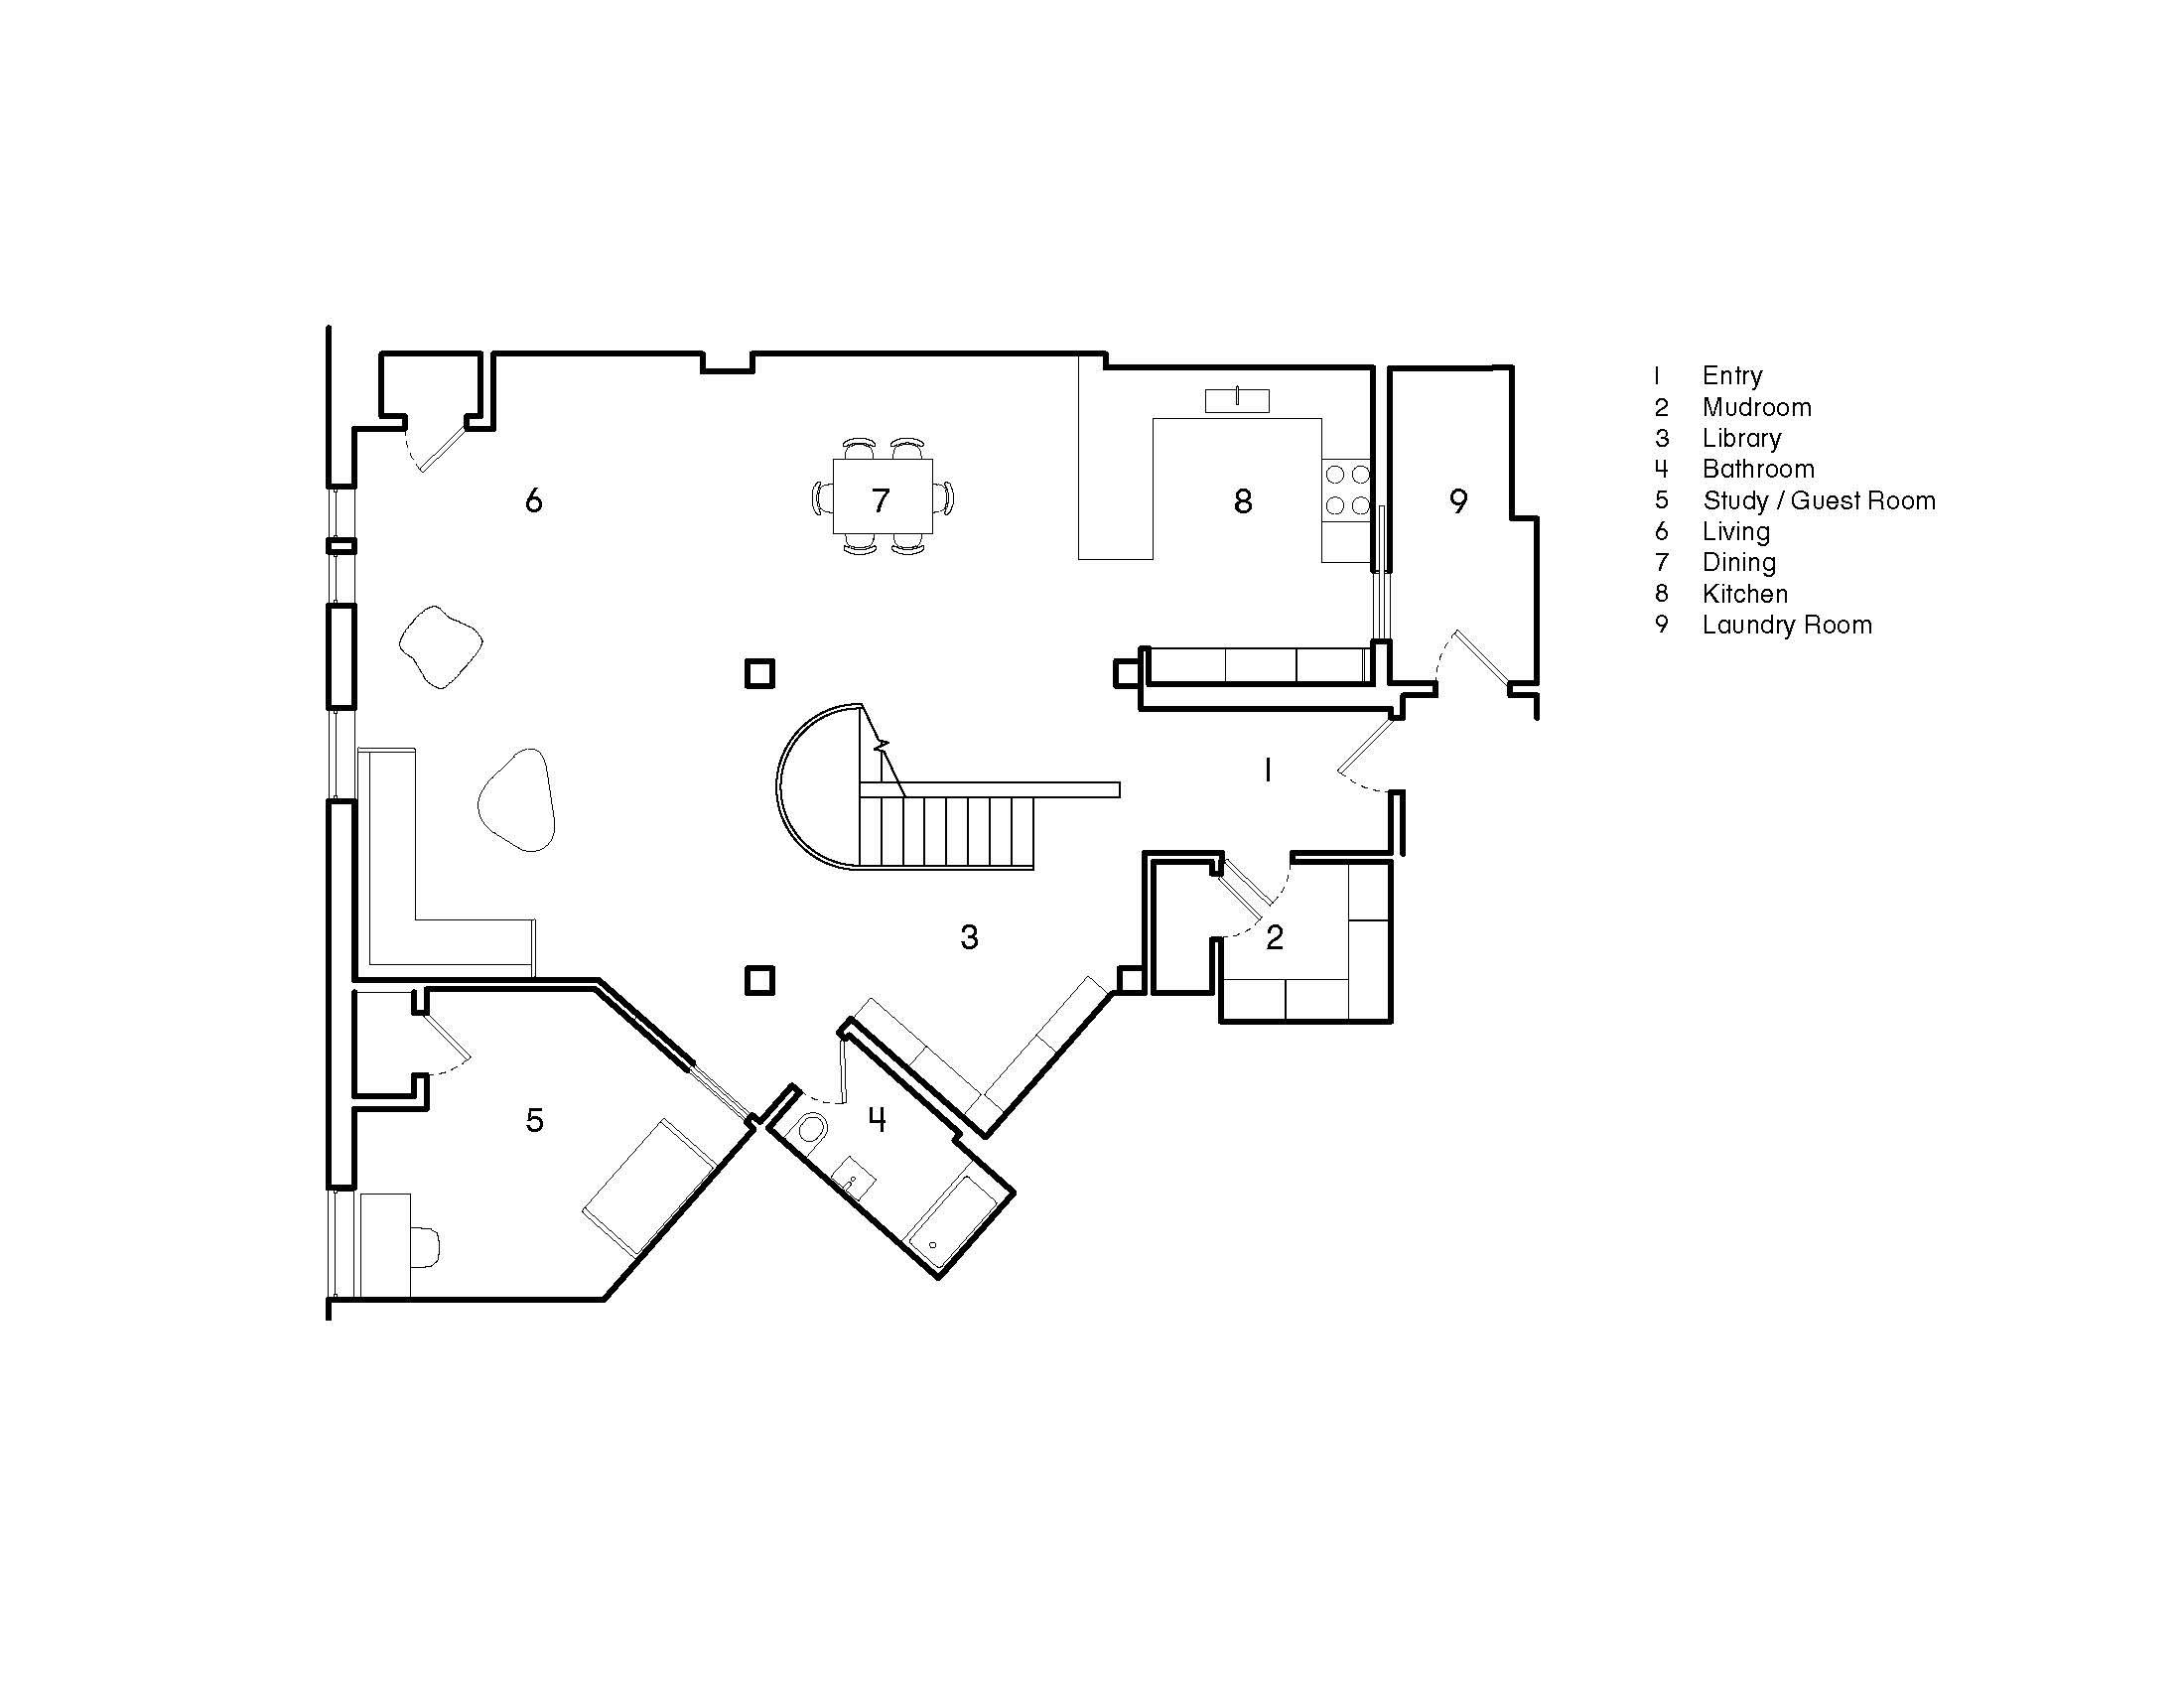 HOLOUBEK - Floor Plan - ENTRY LEVEL-Layout1.jpg